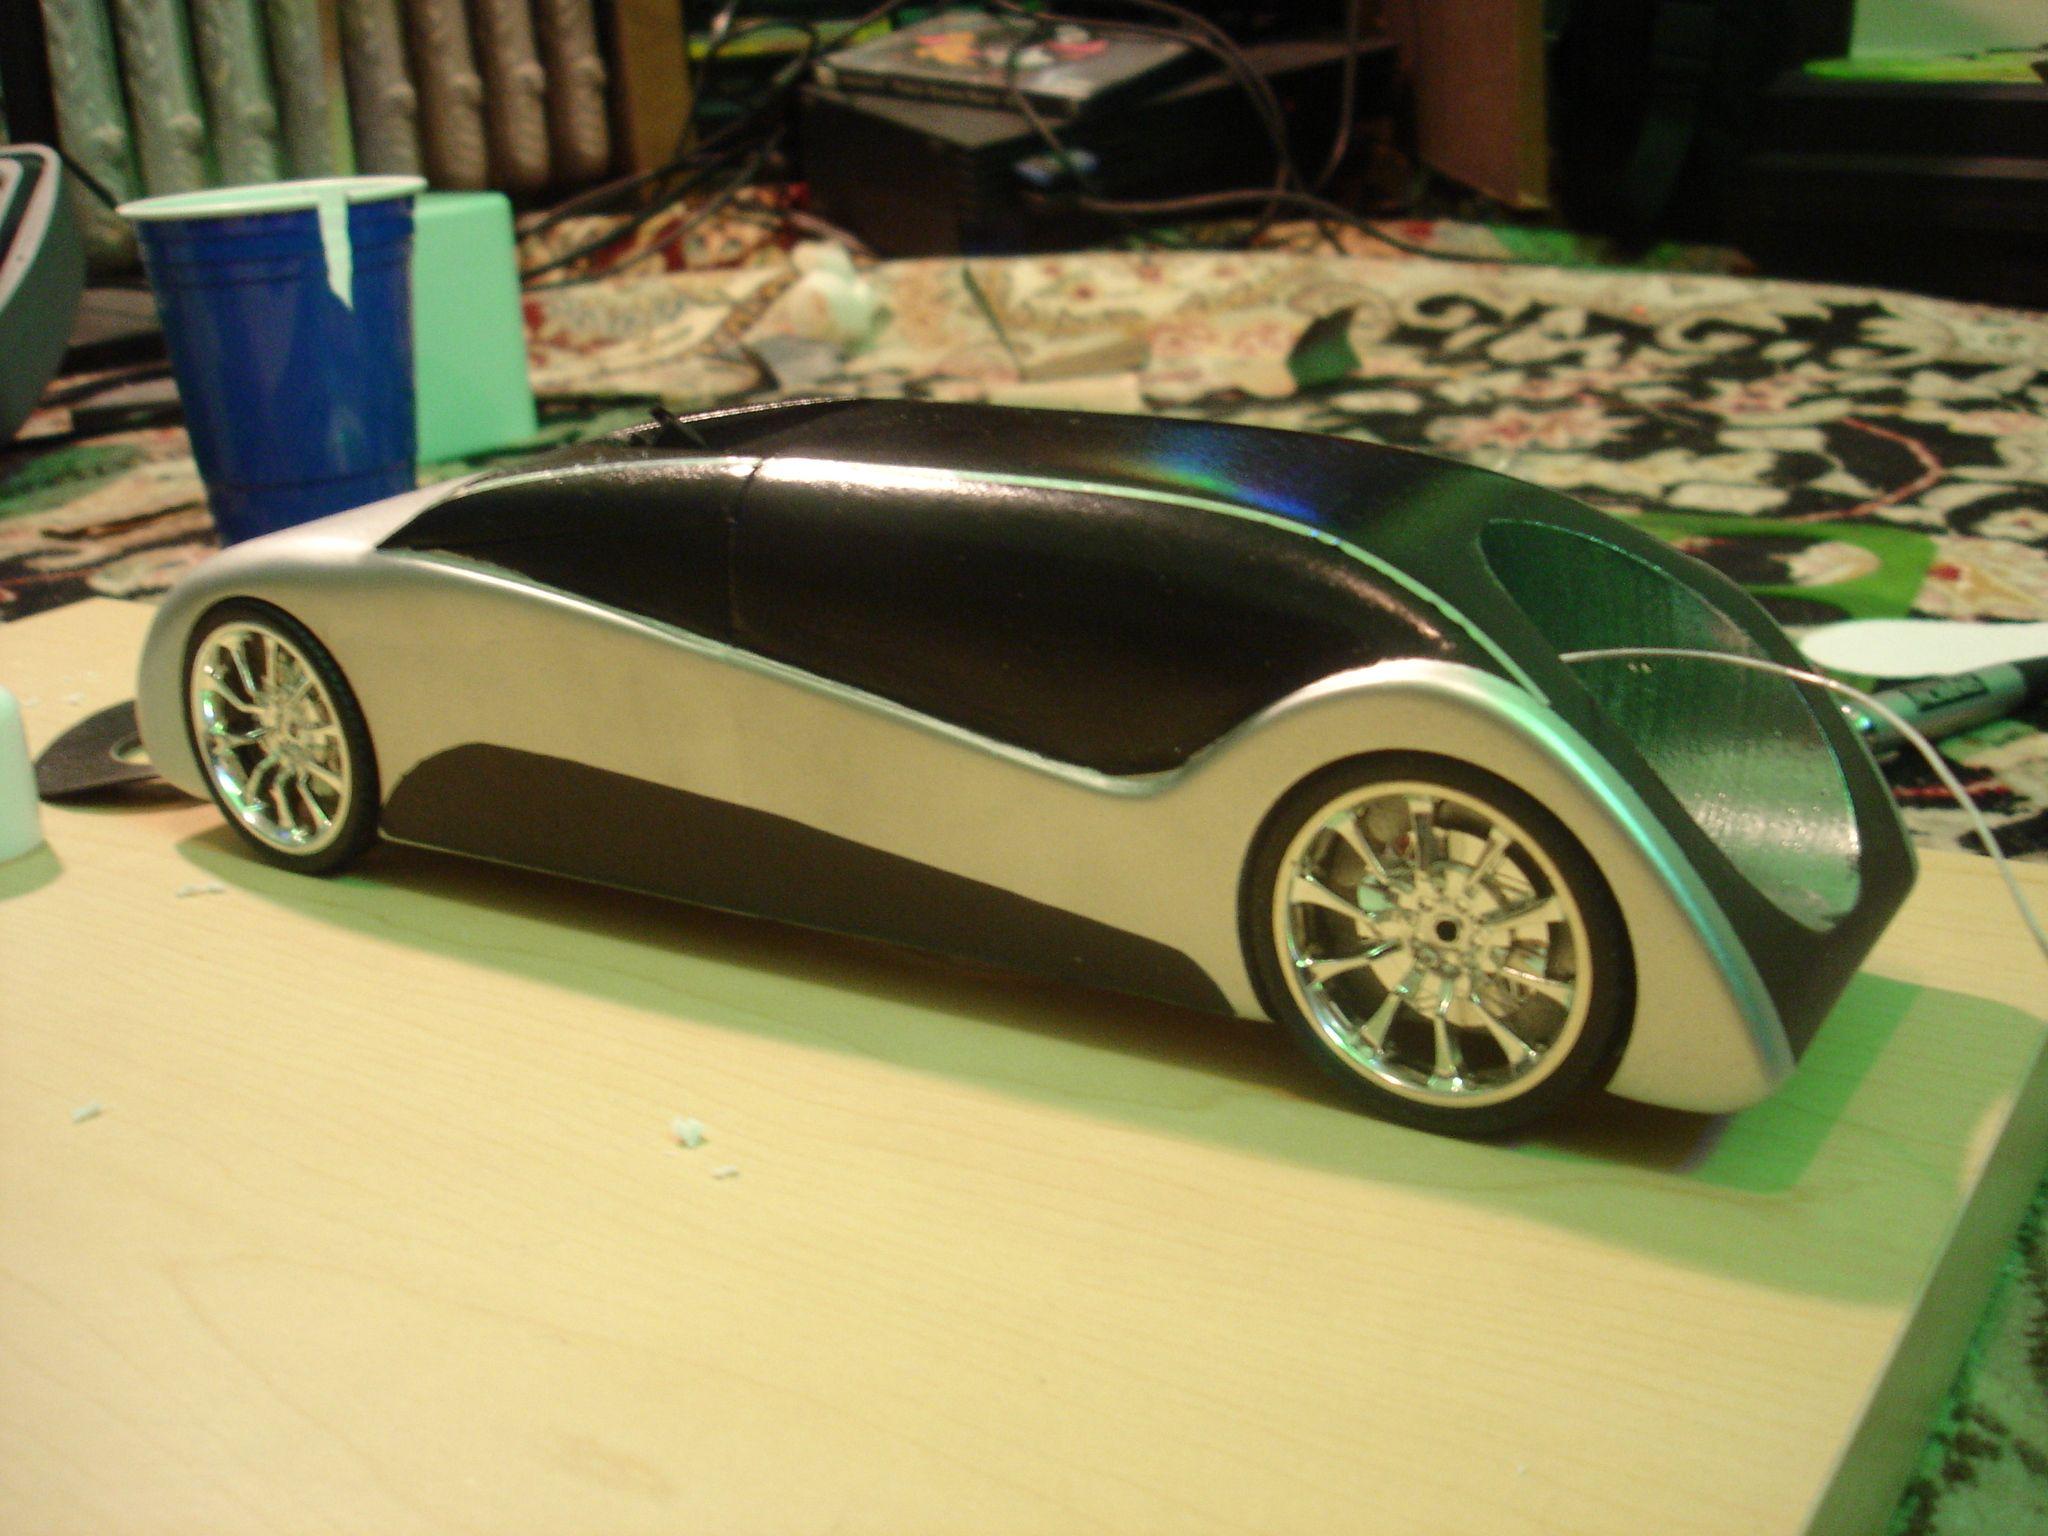 Ferari pinewood derby car designs design